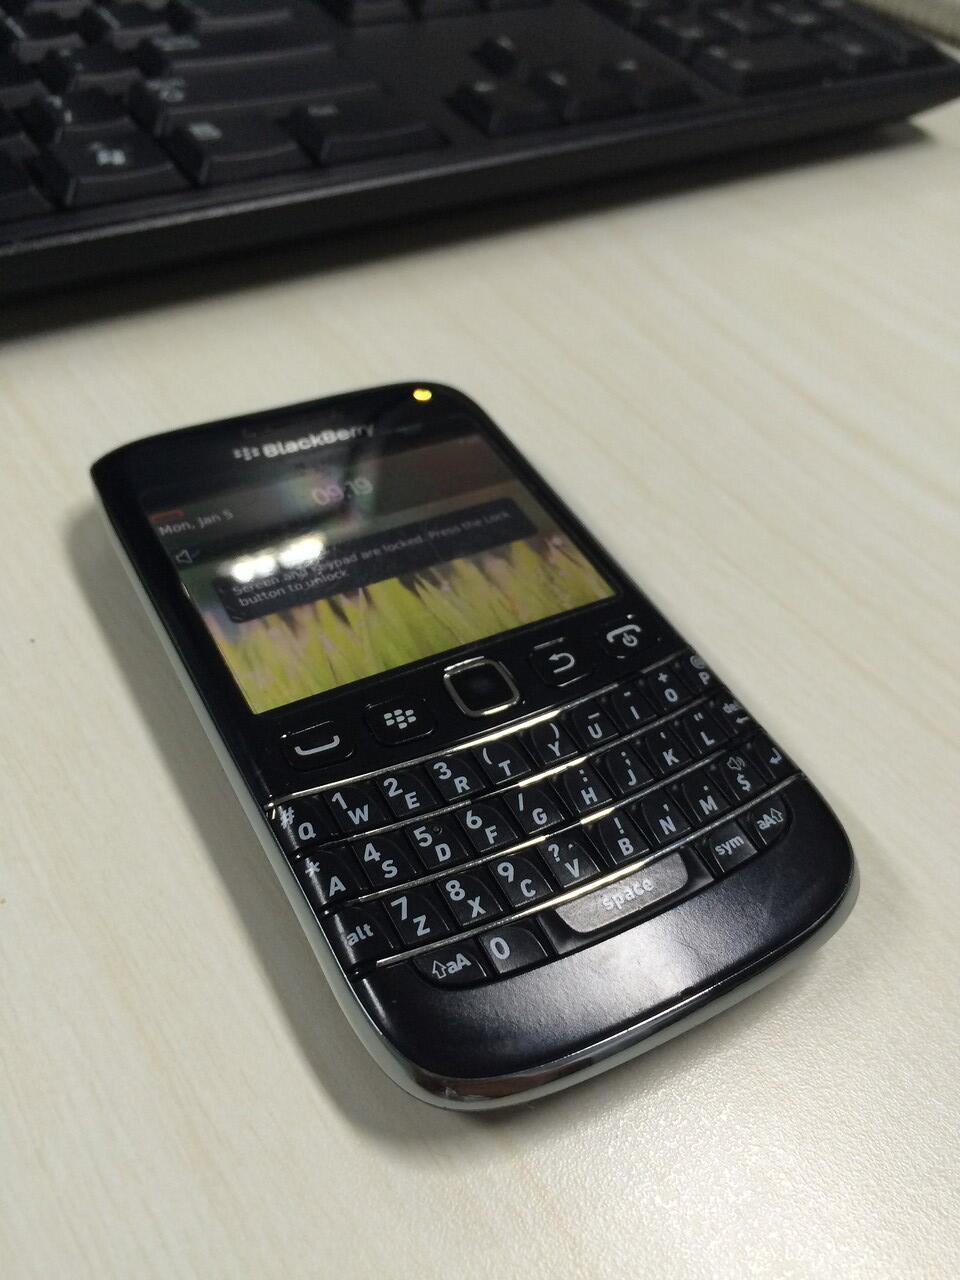 BB onyx 3 or Blackberry Bellagio Jakarta